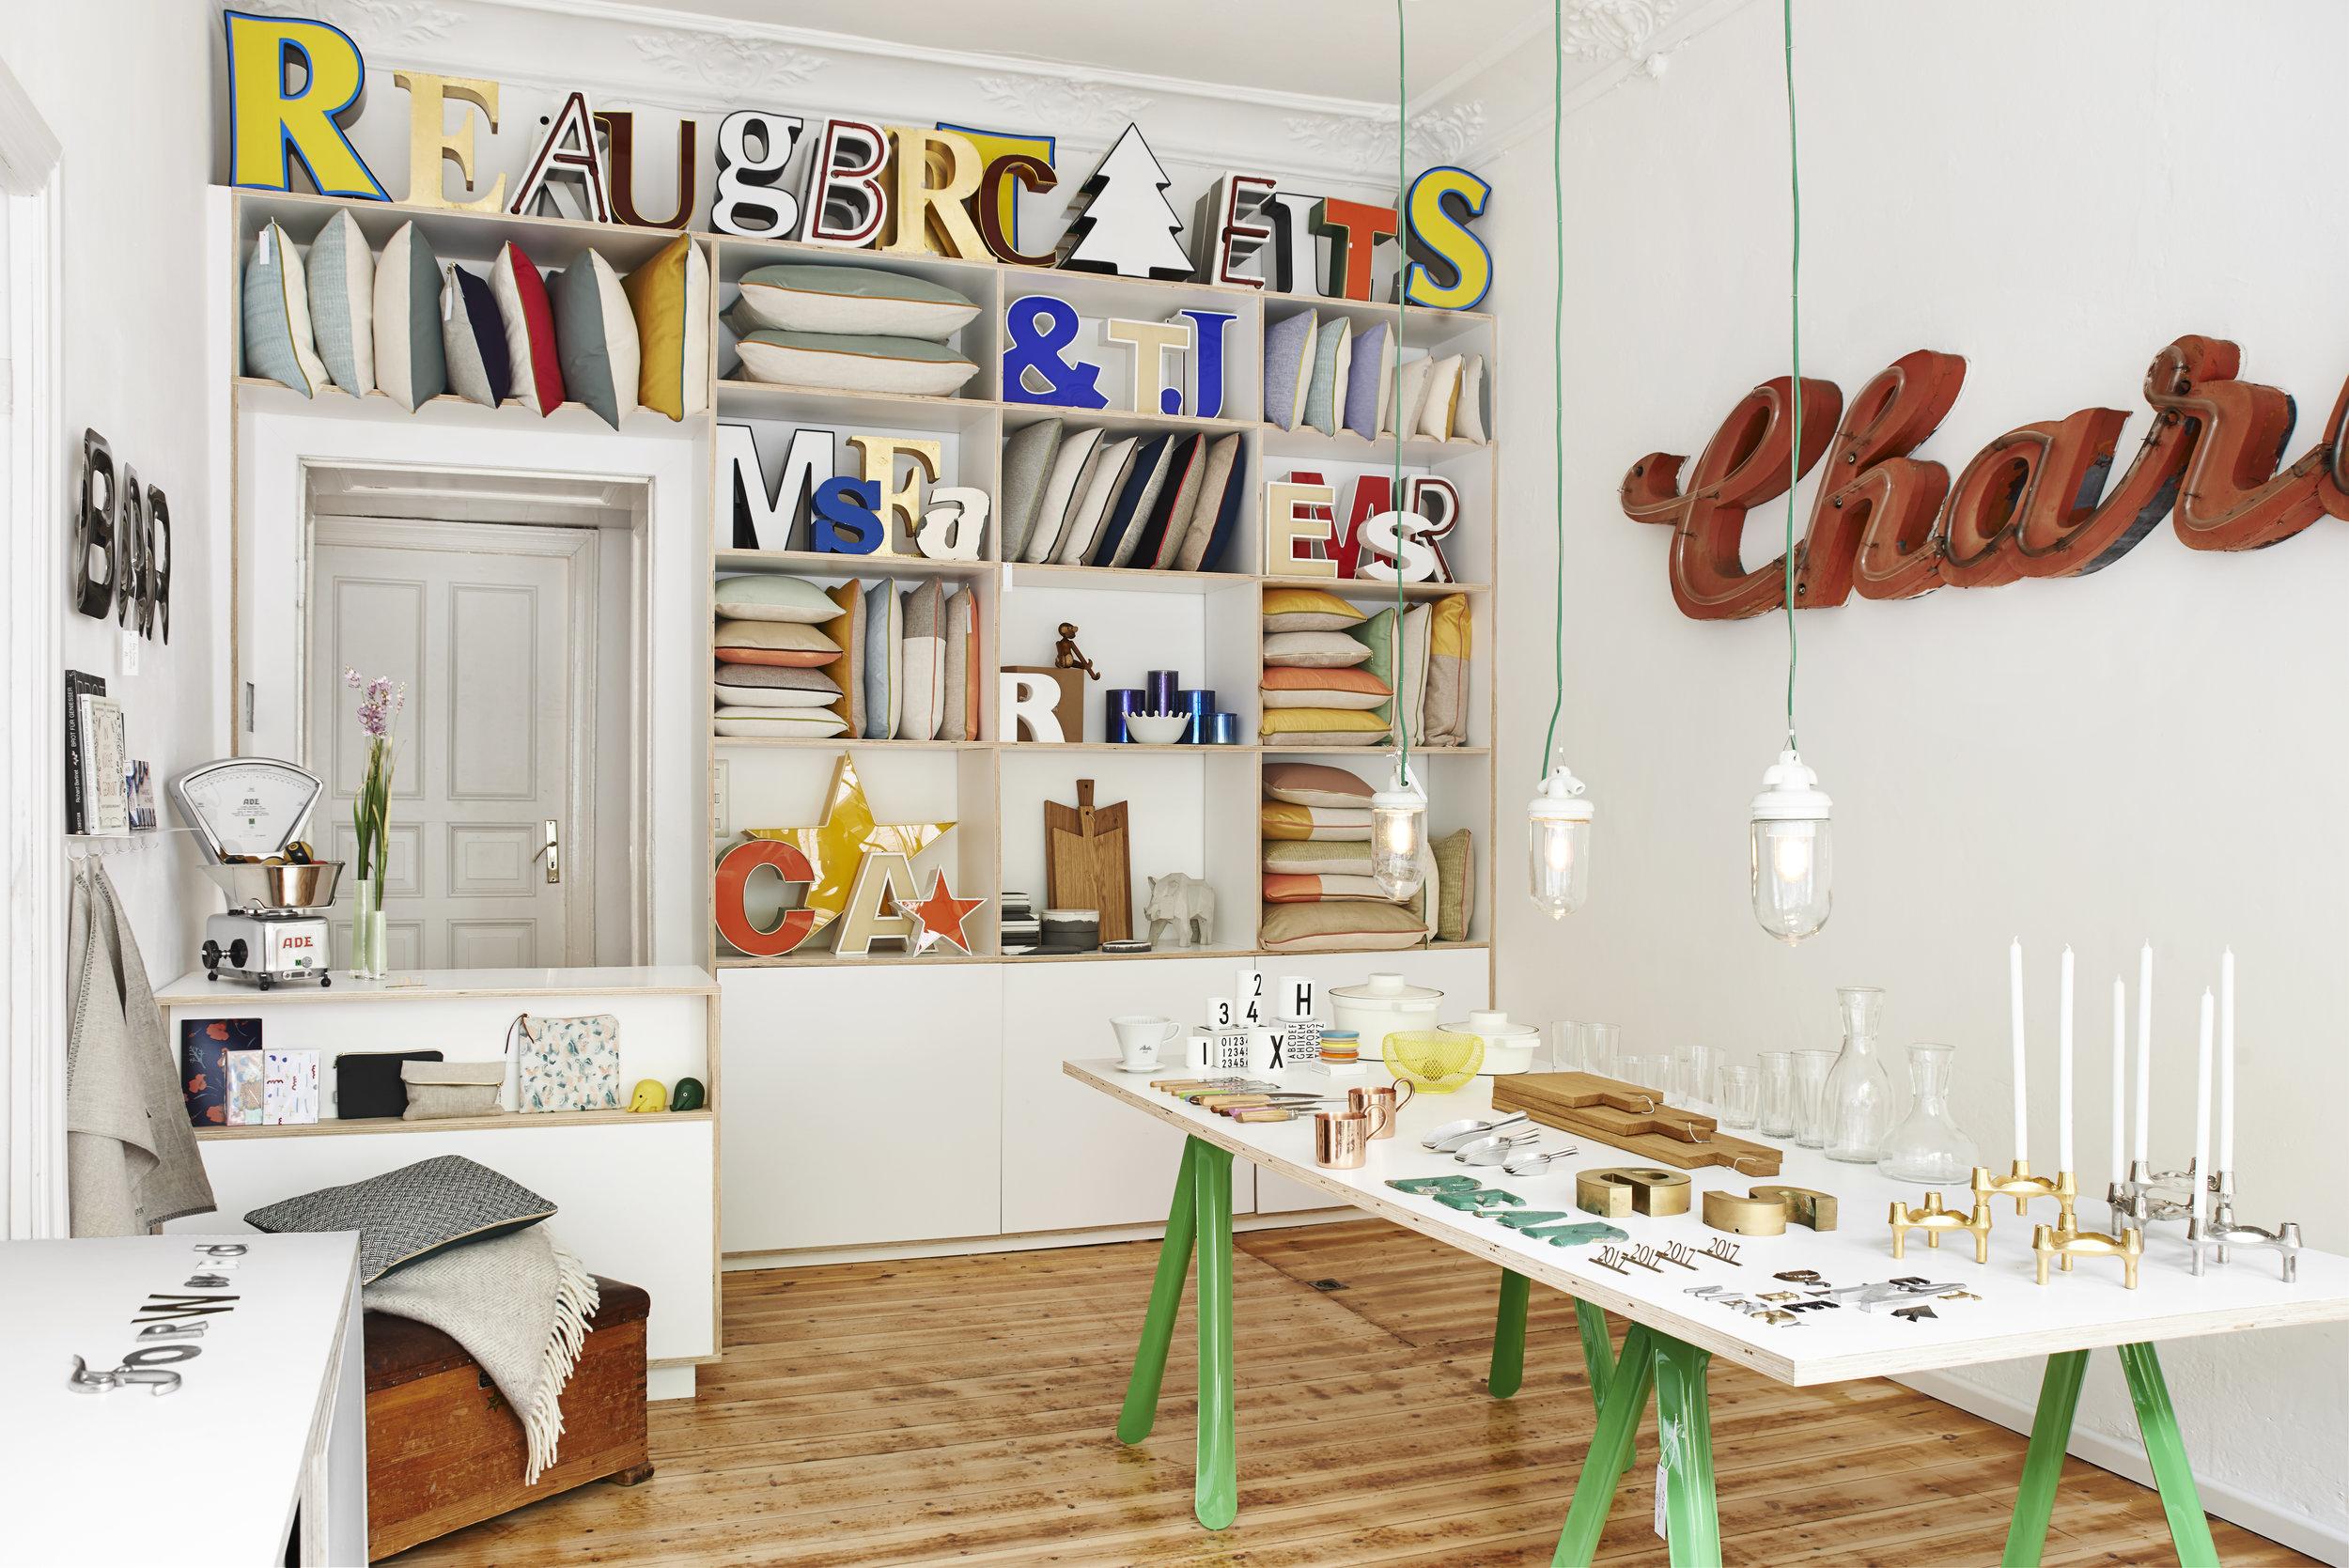 HETTI.1_Shop.jpg